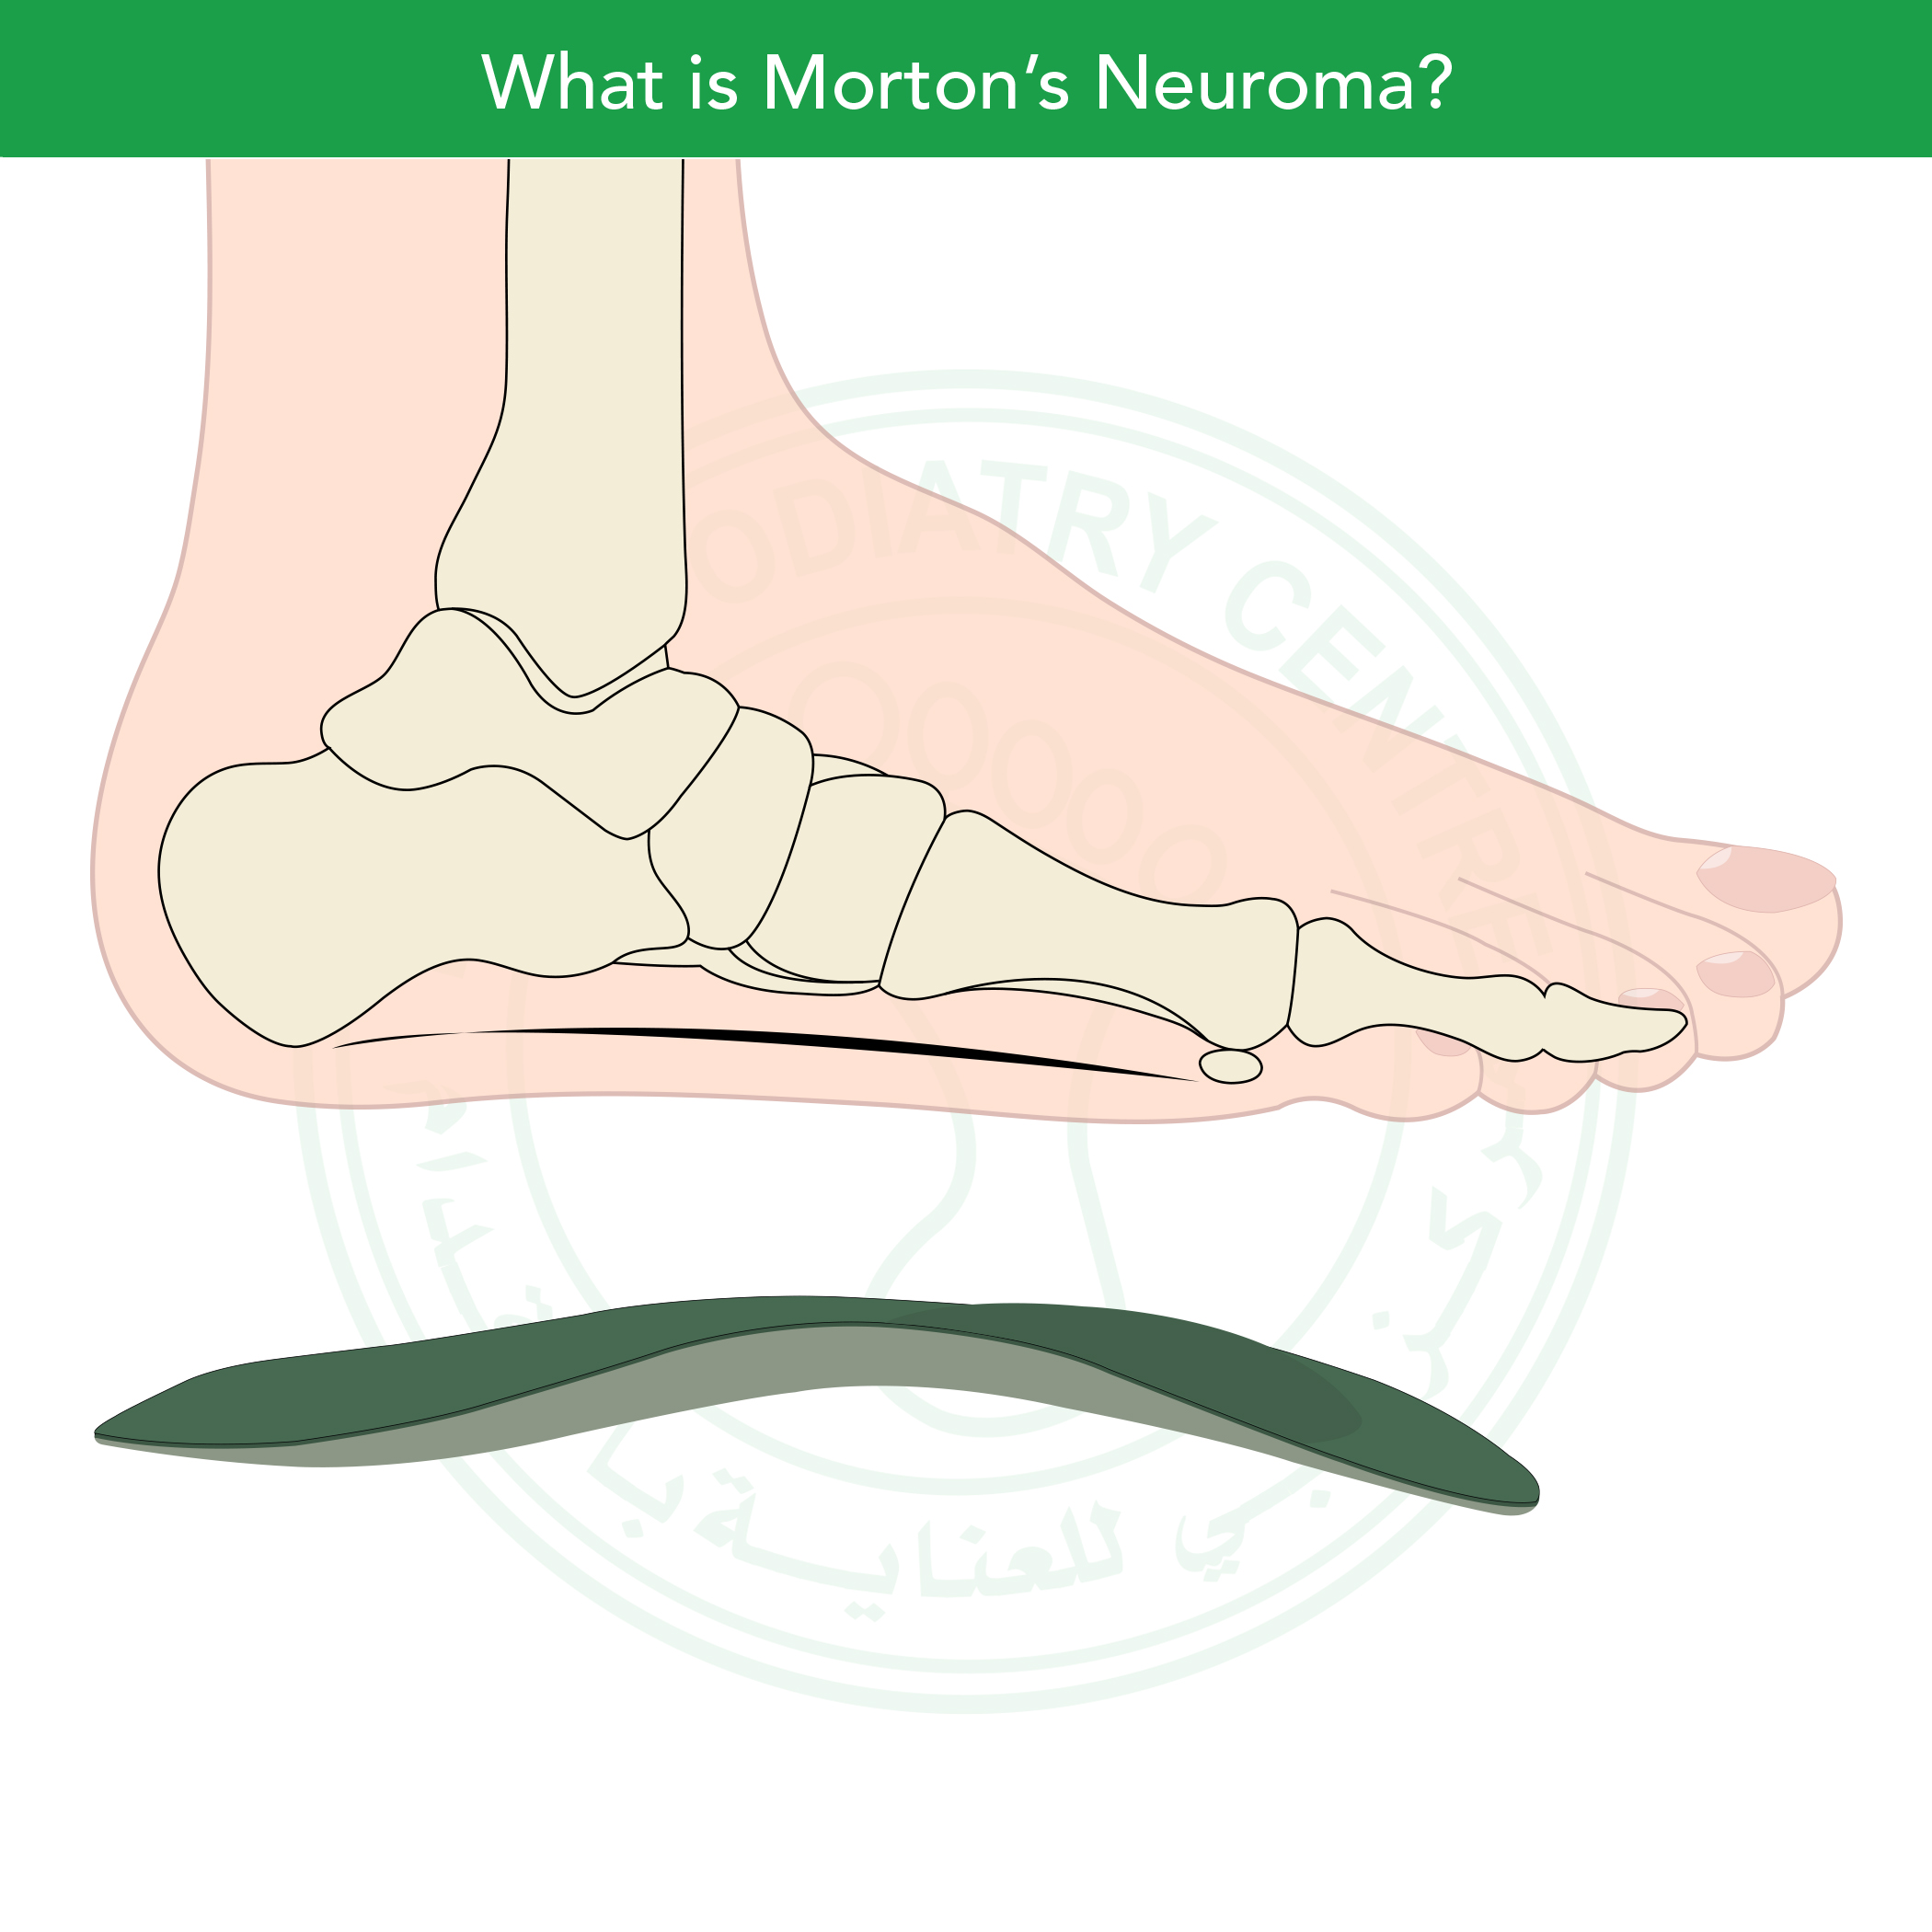 https://dubaipodiatry.com/wp-content/uploads/2019/03/DPC-voice-record_Mortons-Neuroma-25.jpg